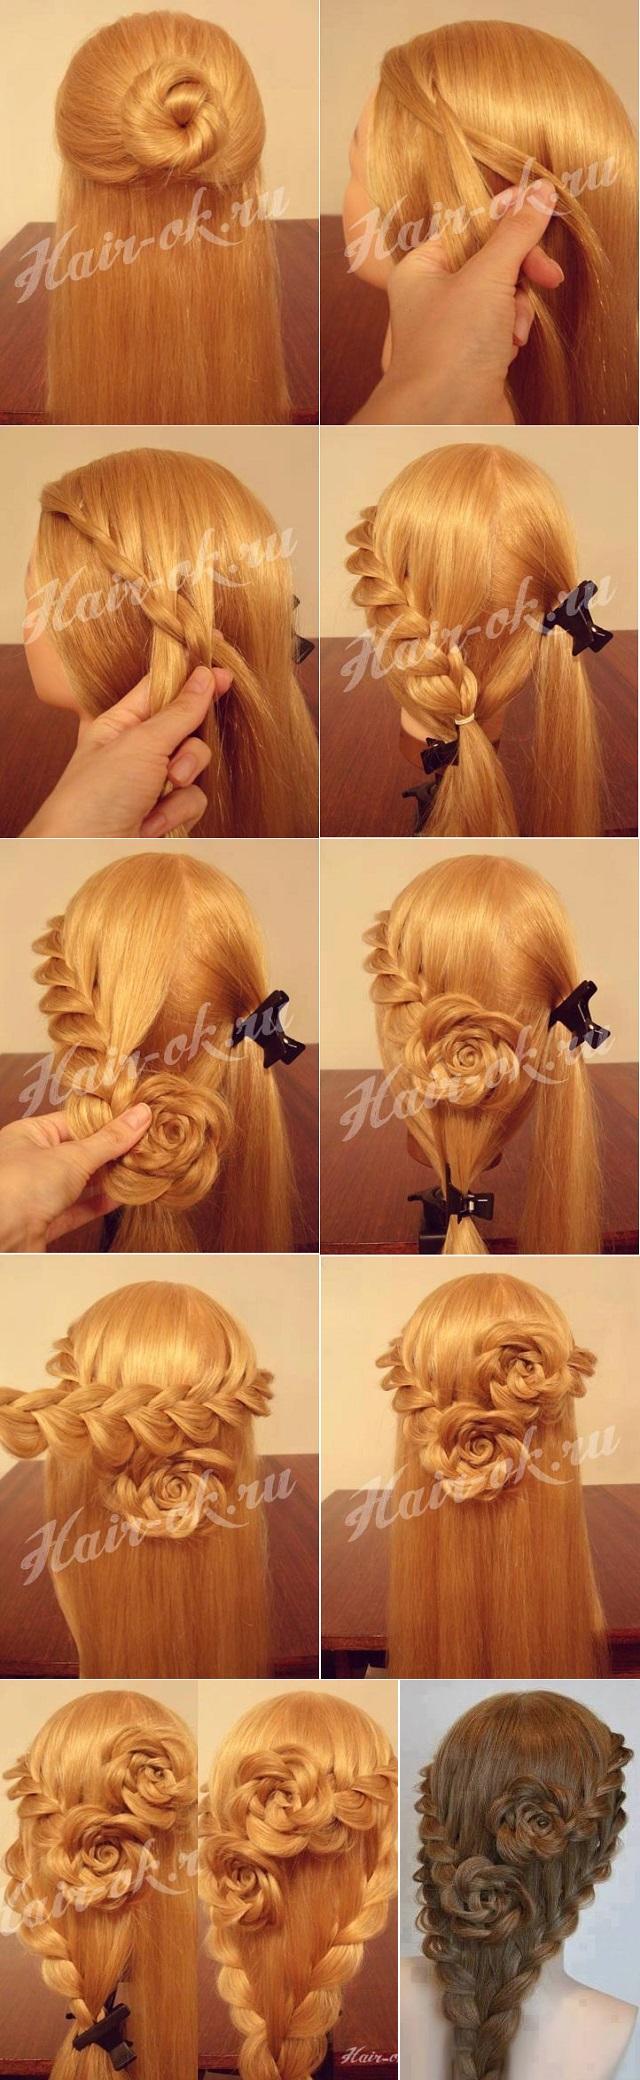 rose flower: rose flower hairstyle